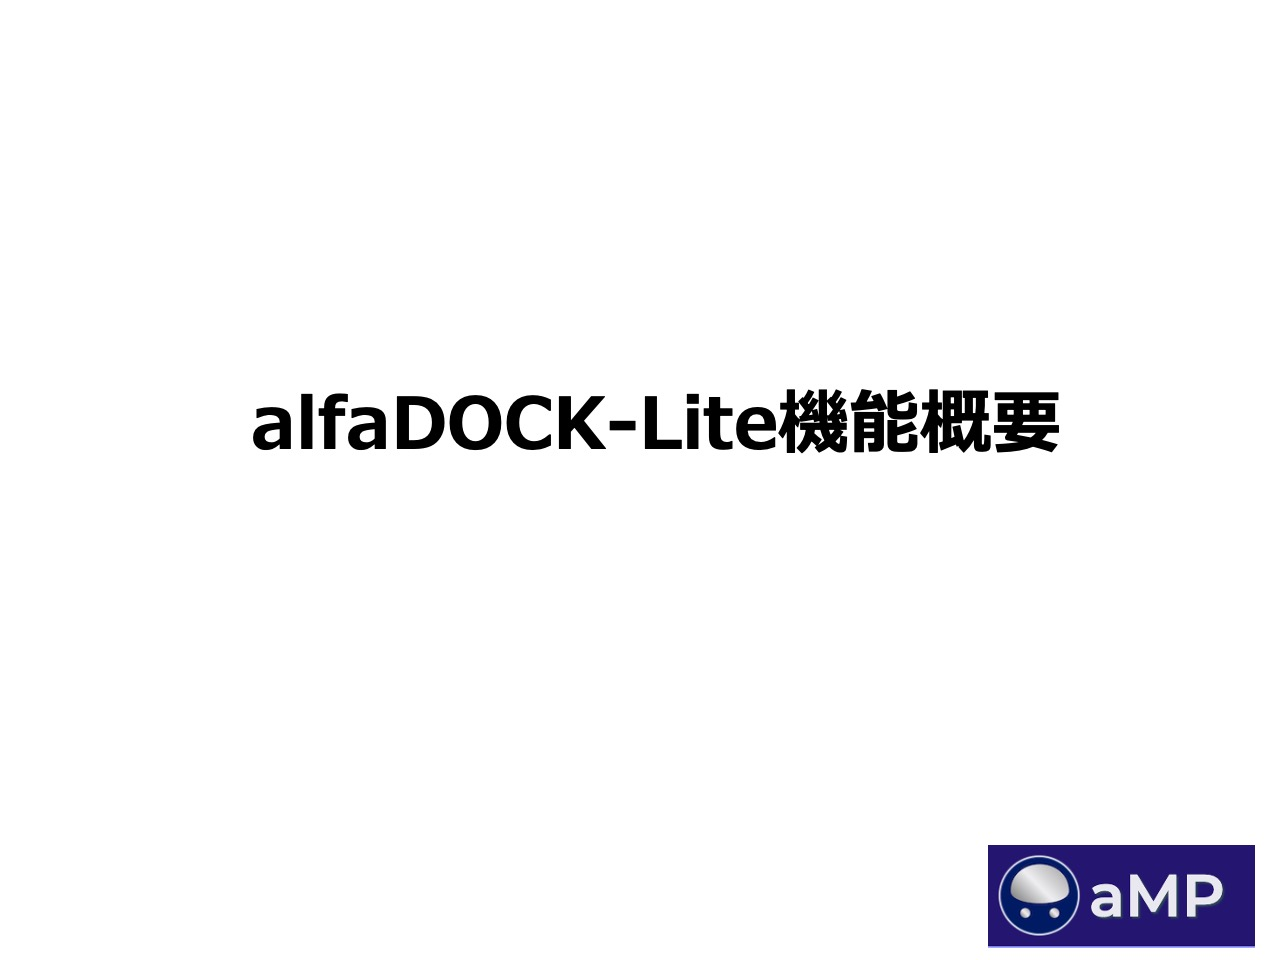 01-alfaDOCKLite aMP機能概要20200507